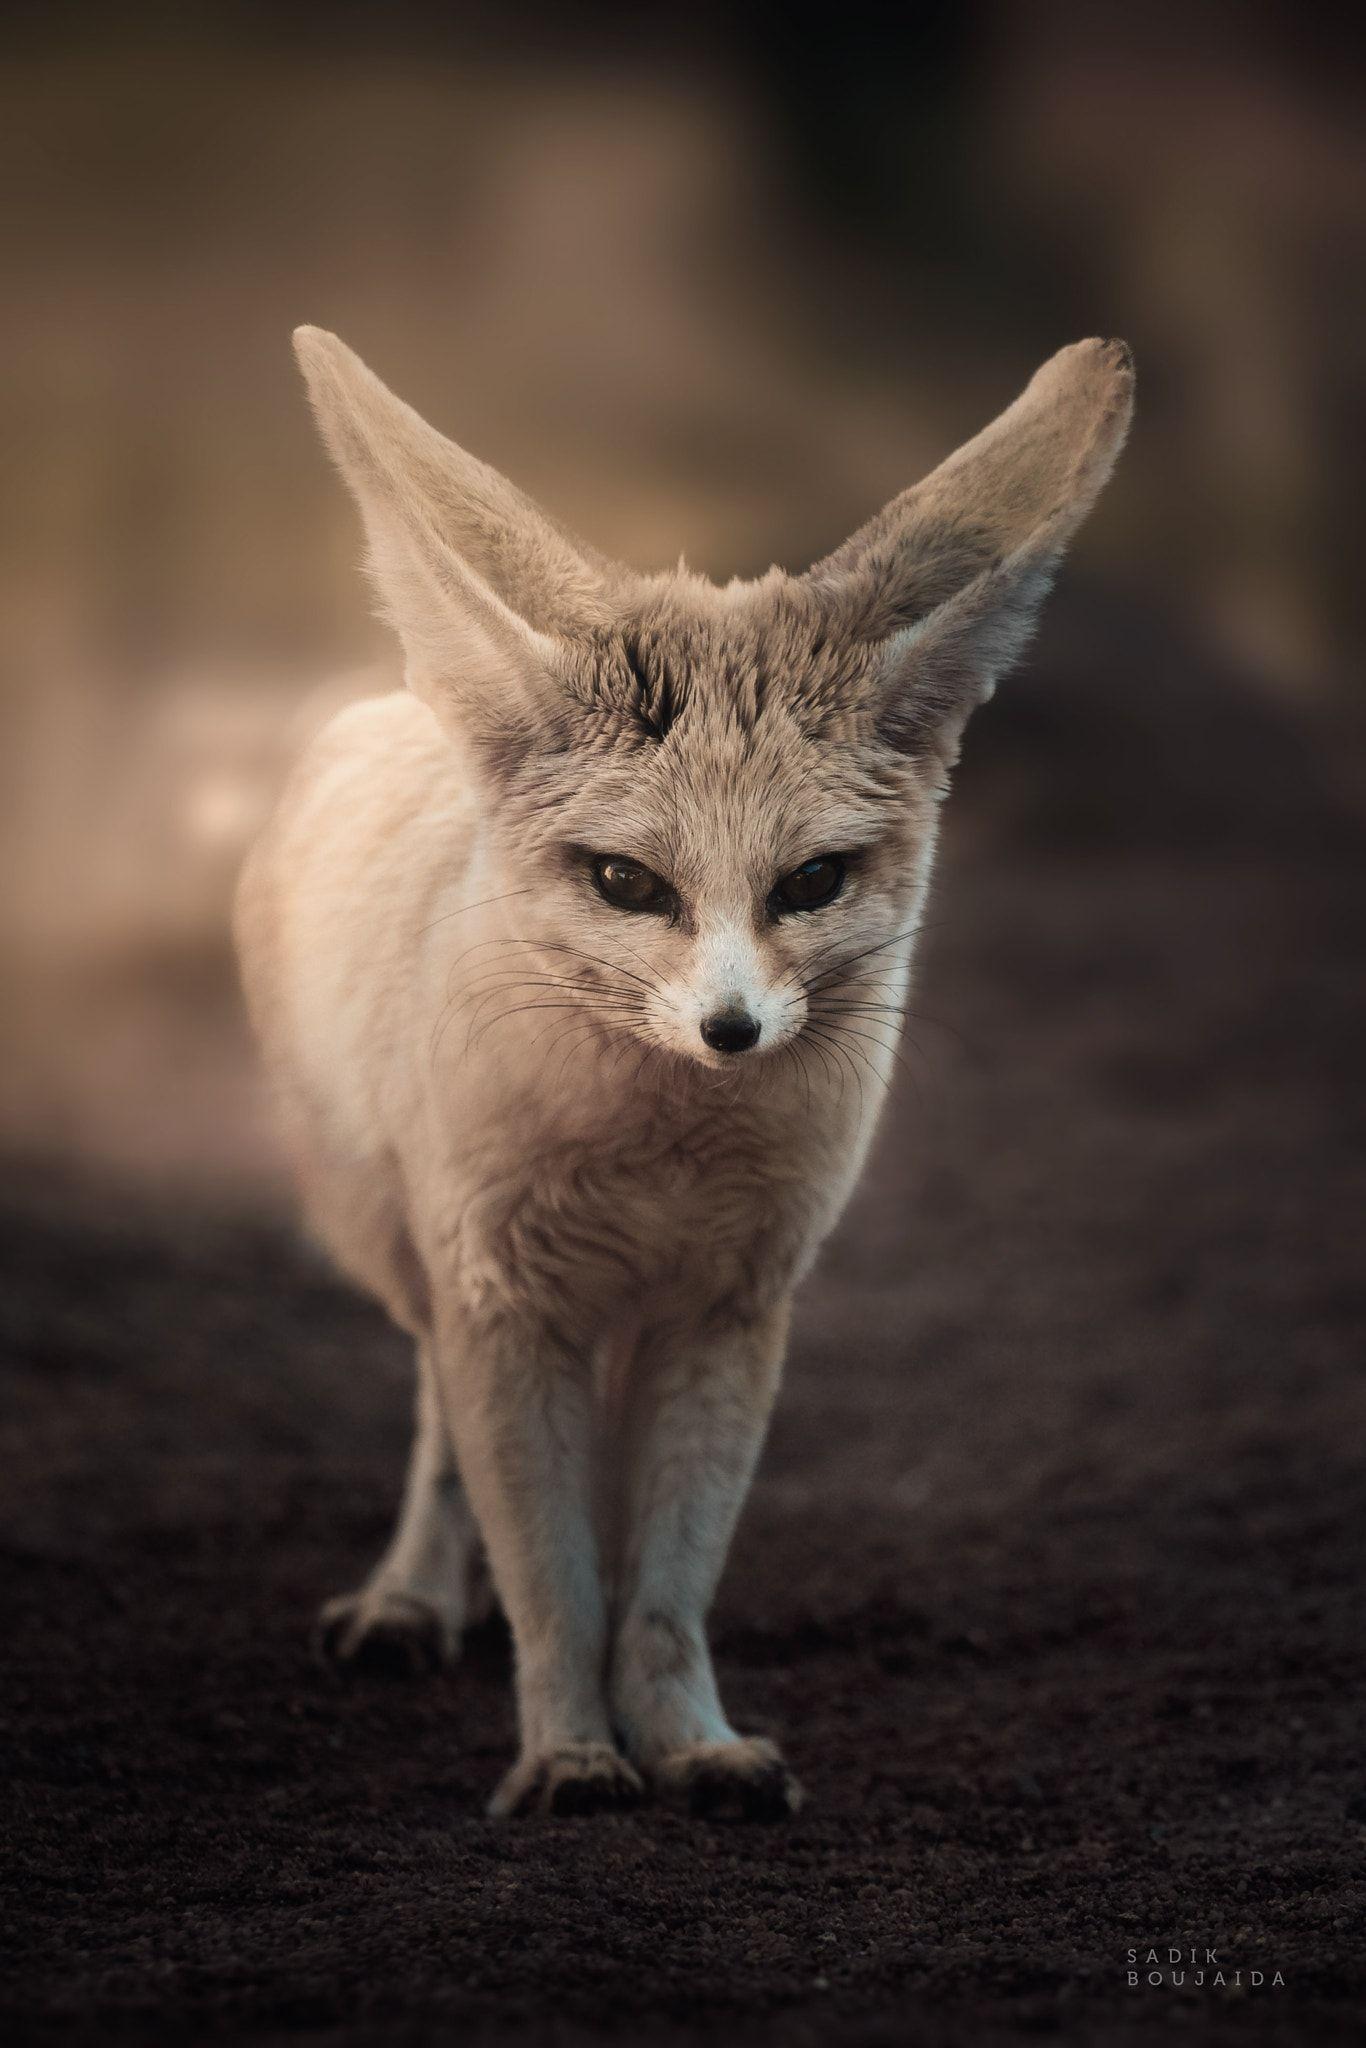 bat eared fox krefeld BB2A1431 | Bat eared fox, Baby